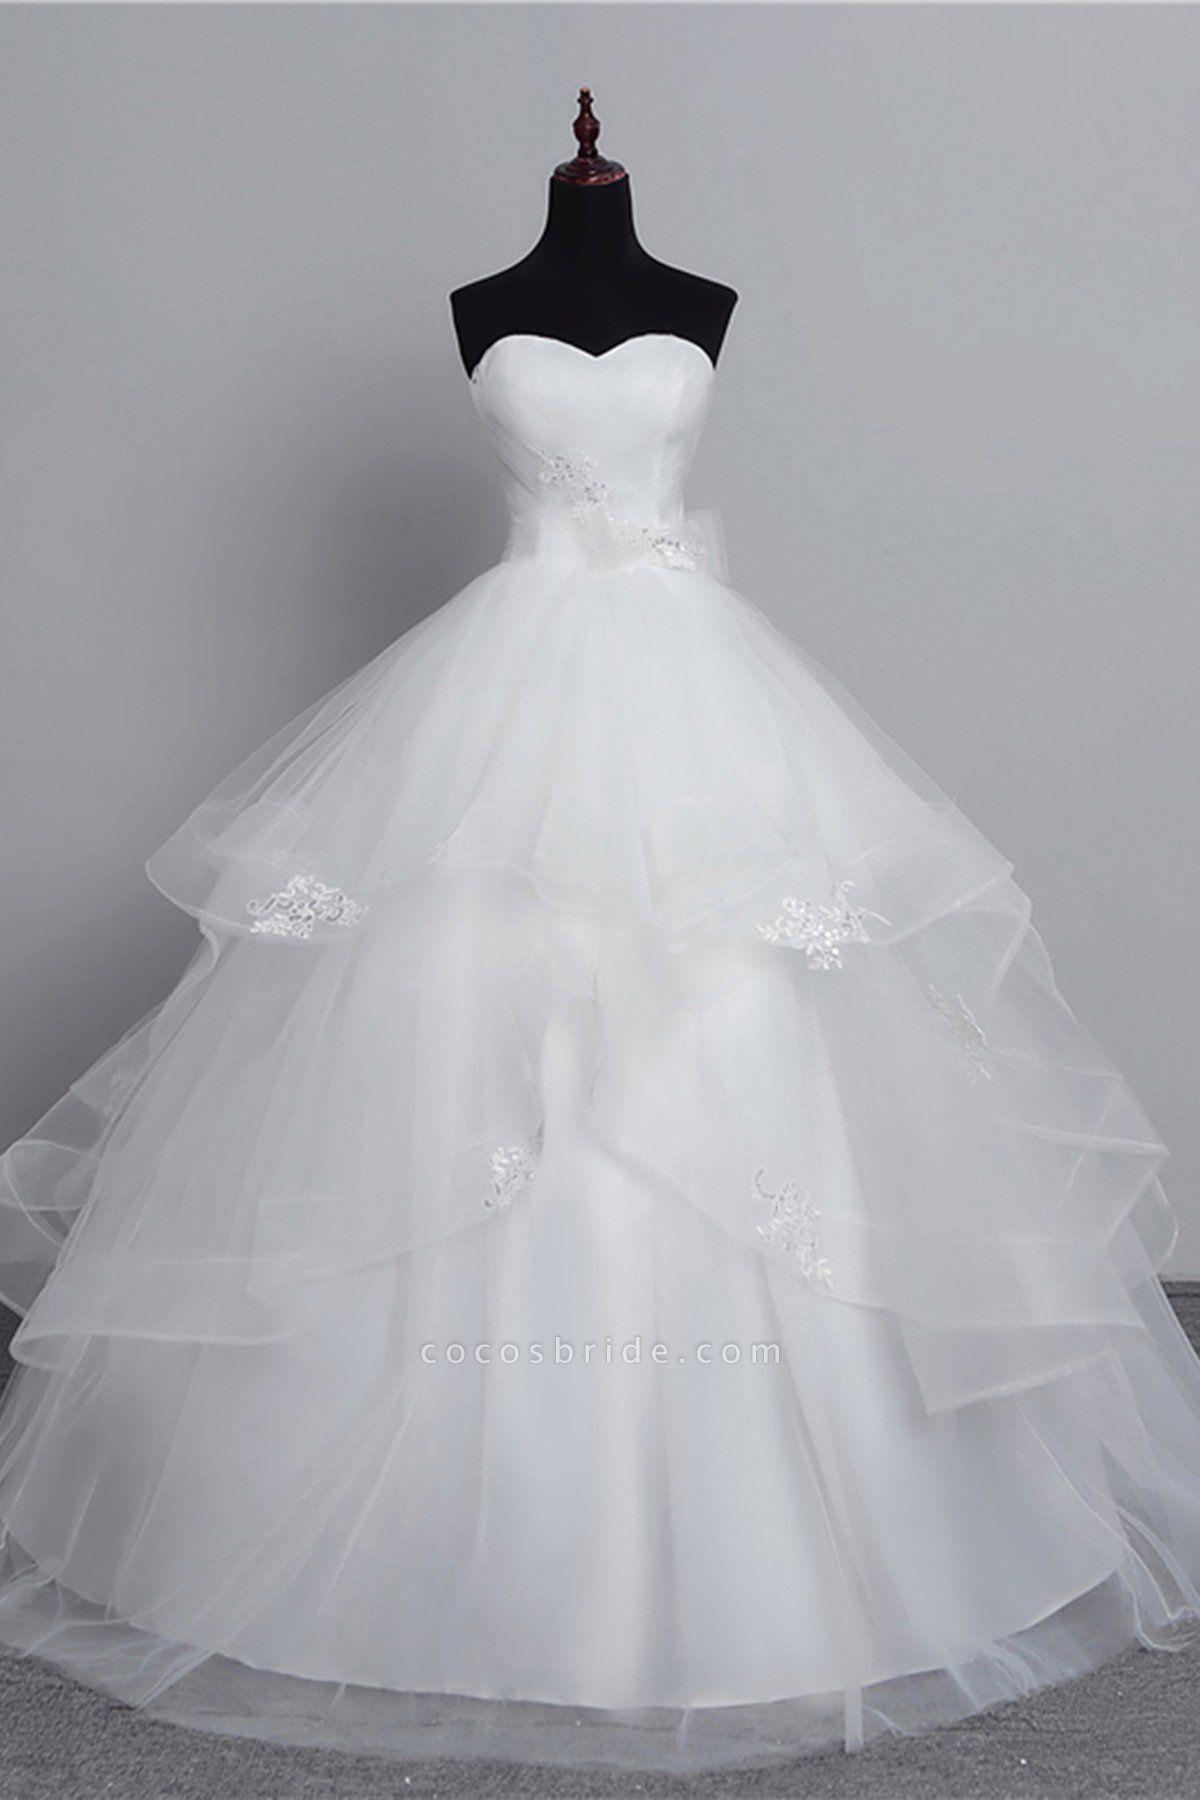 White Tulle Layered Strapless Vintage Wedding Dress